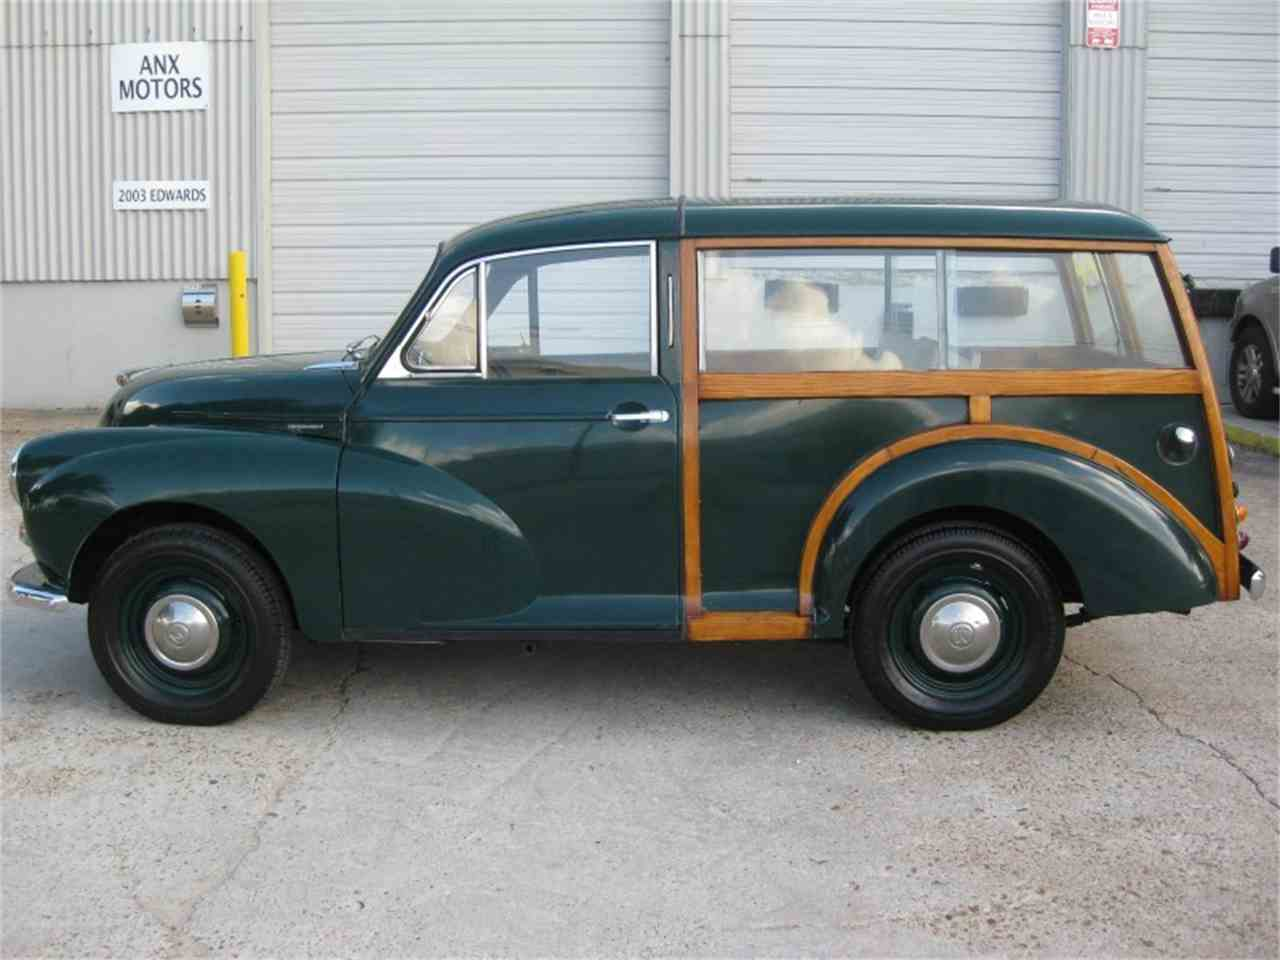 Morris minor traveller for sale - 1956 Morris Minor 1000 2dr Traveler For Sale Cc 979314